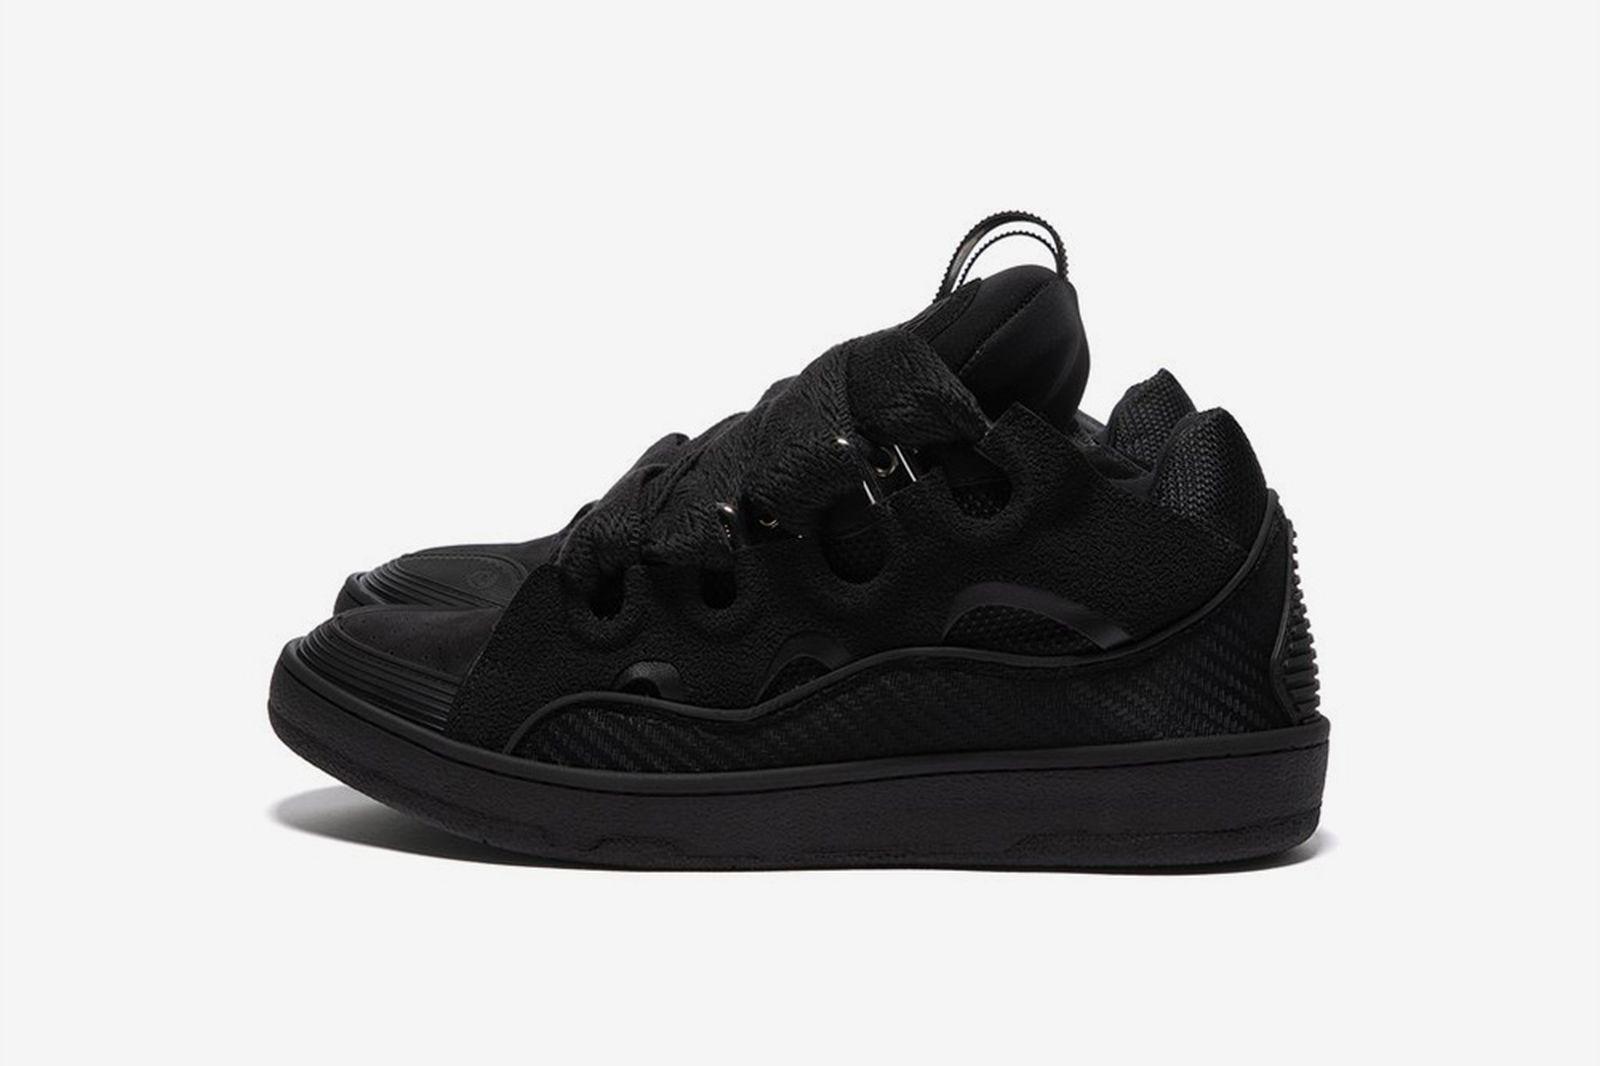 lanvin-curb-all-black-release-date-price-02